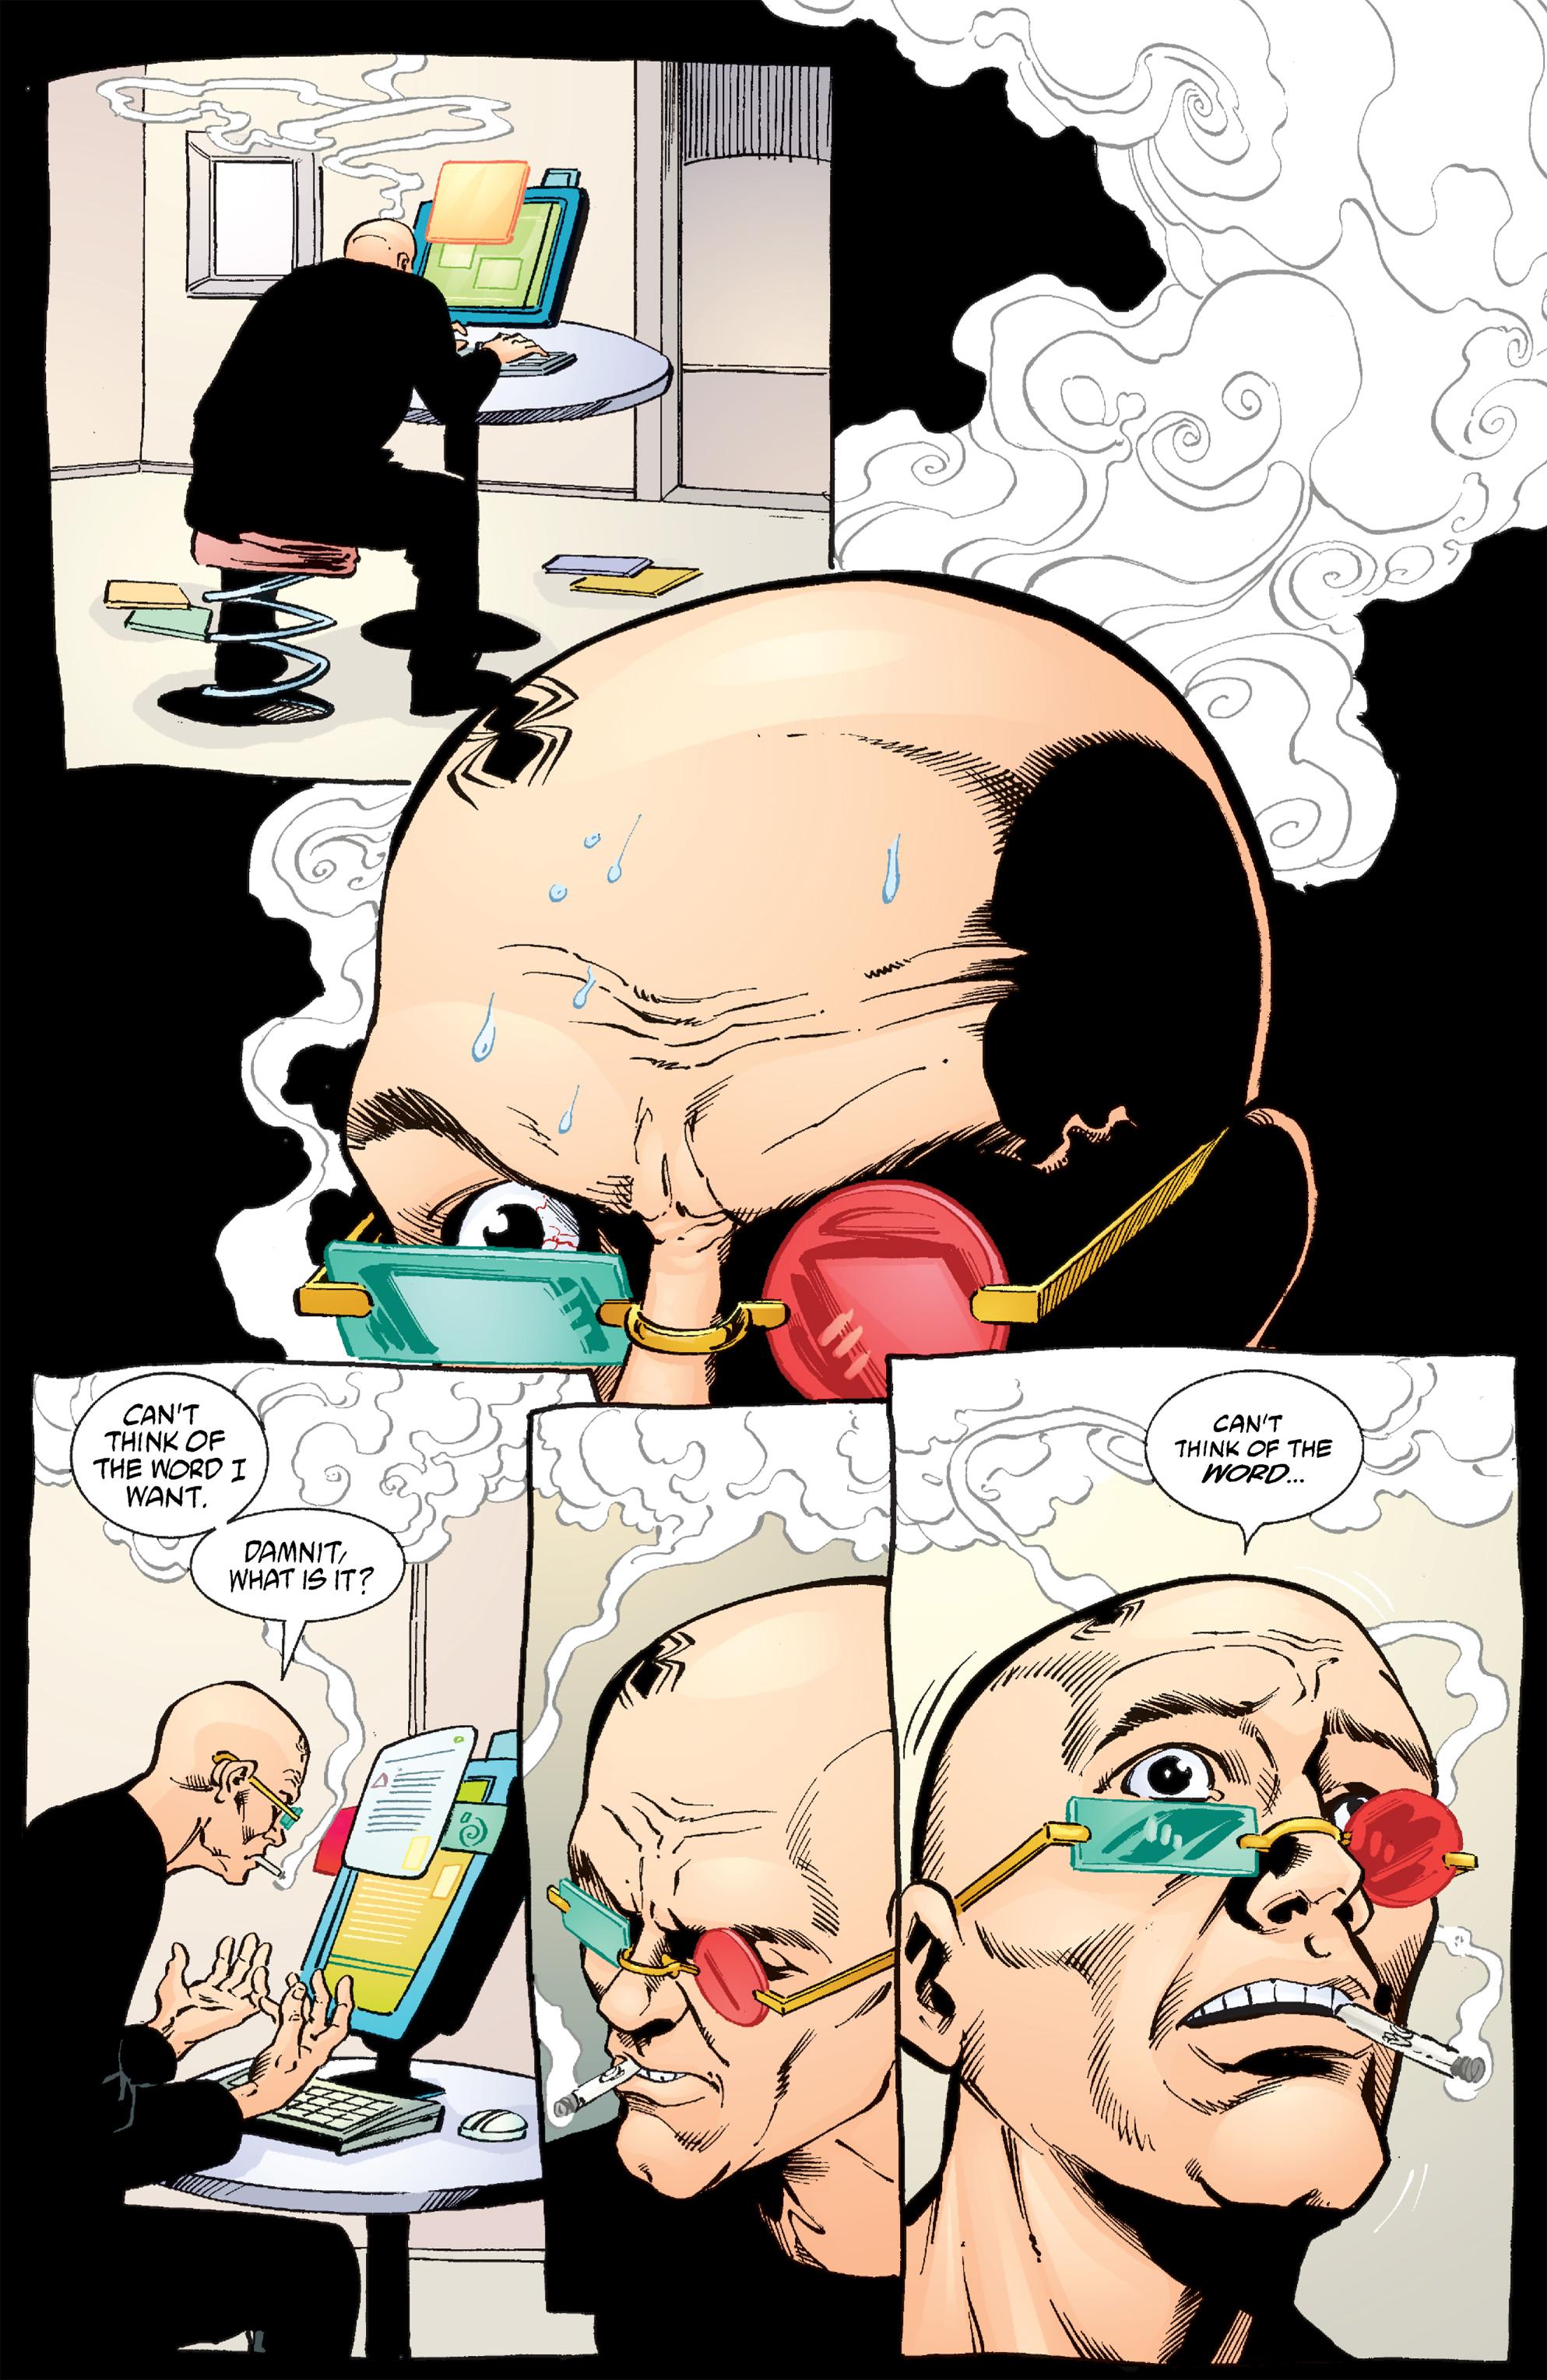 Read online Transmetropolitan comic -  Issue #54 - 13